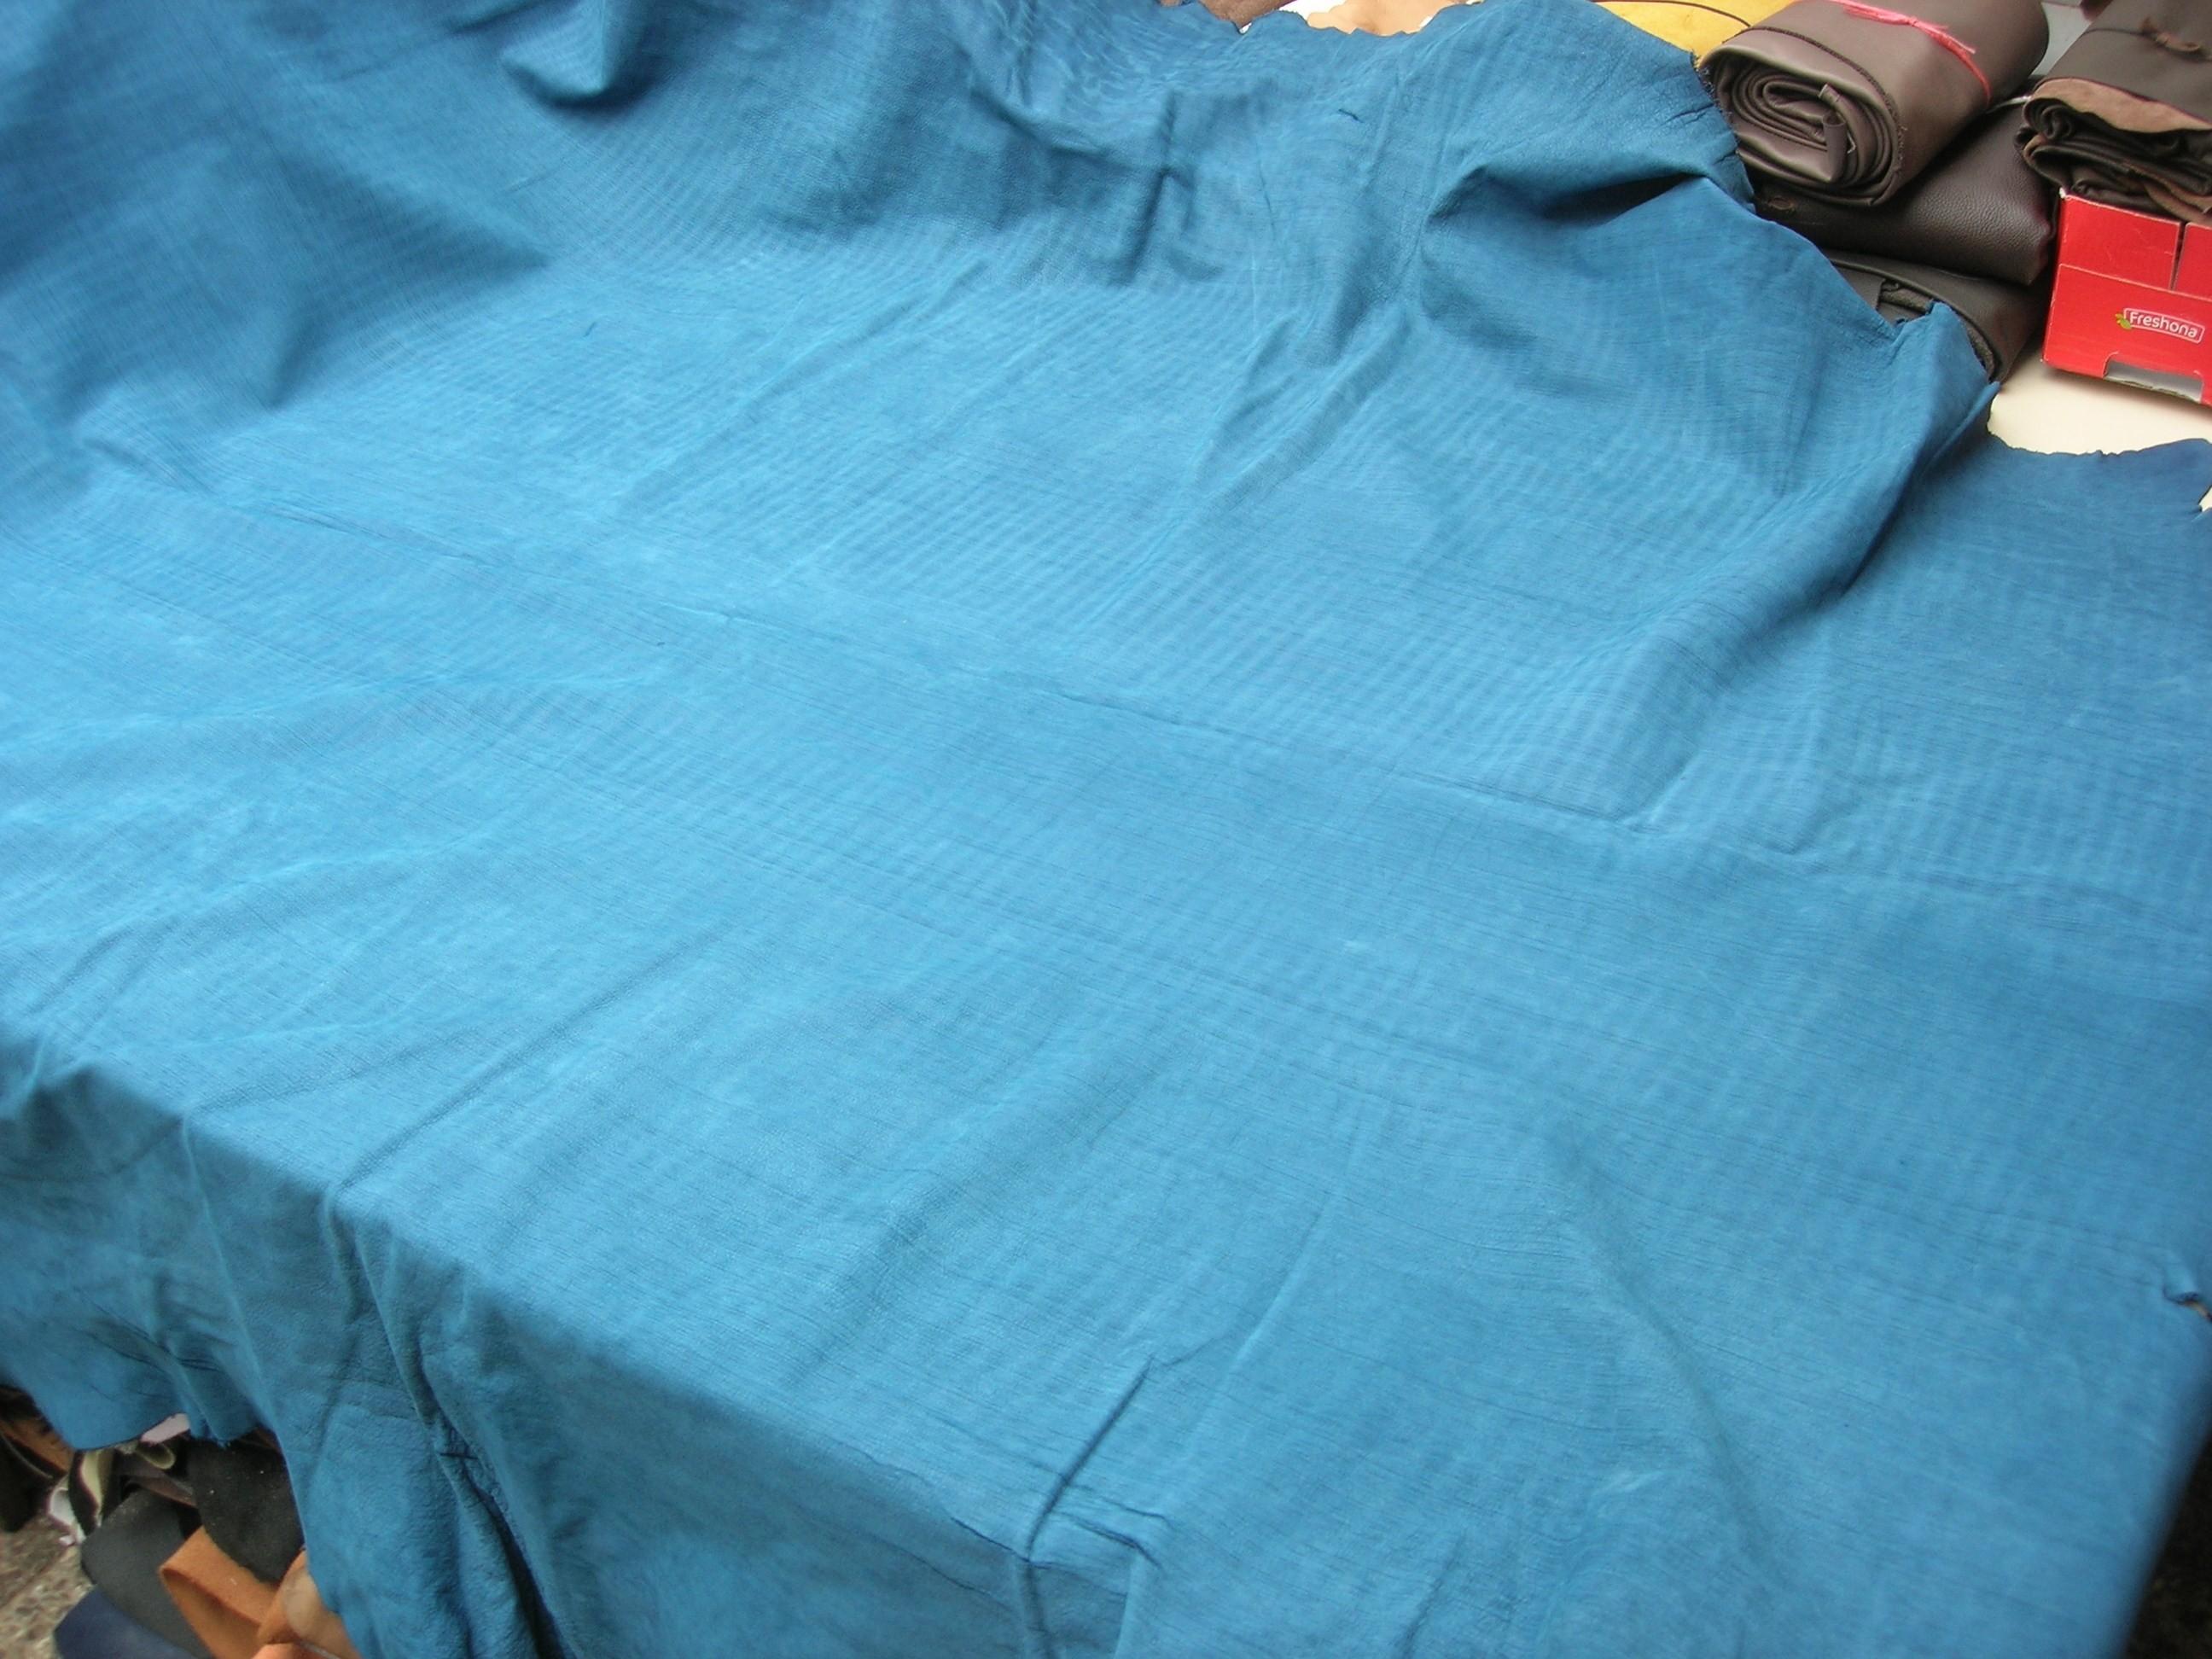 Möbelleder blau-türkis gestrichelt anilin 1,5 mm (E191150KG)